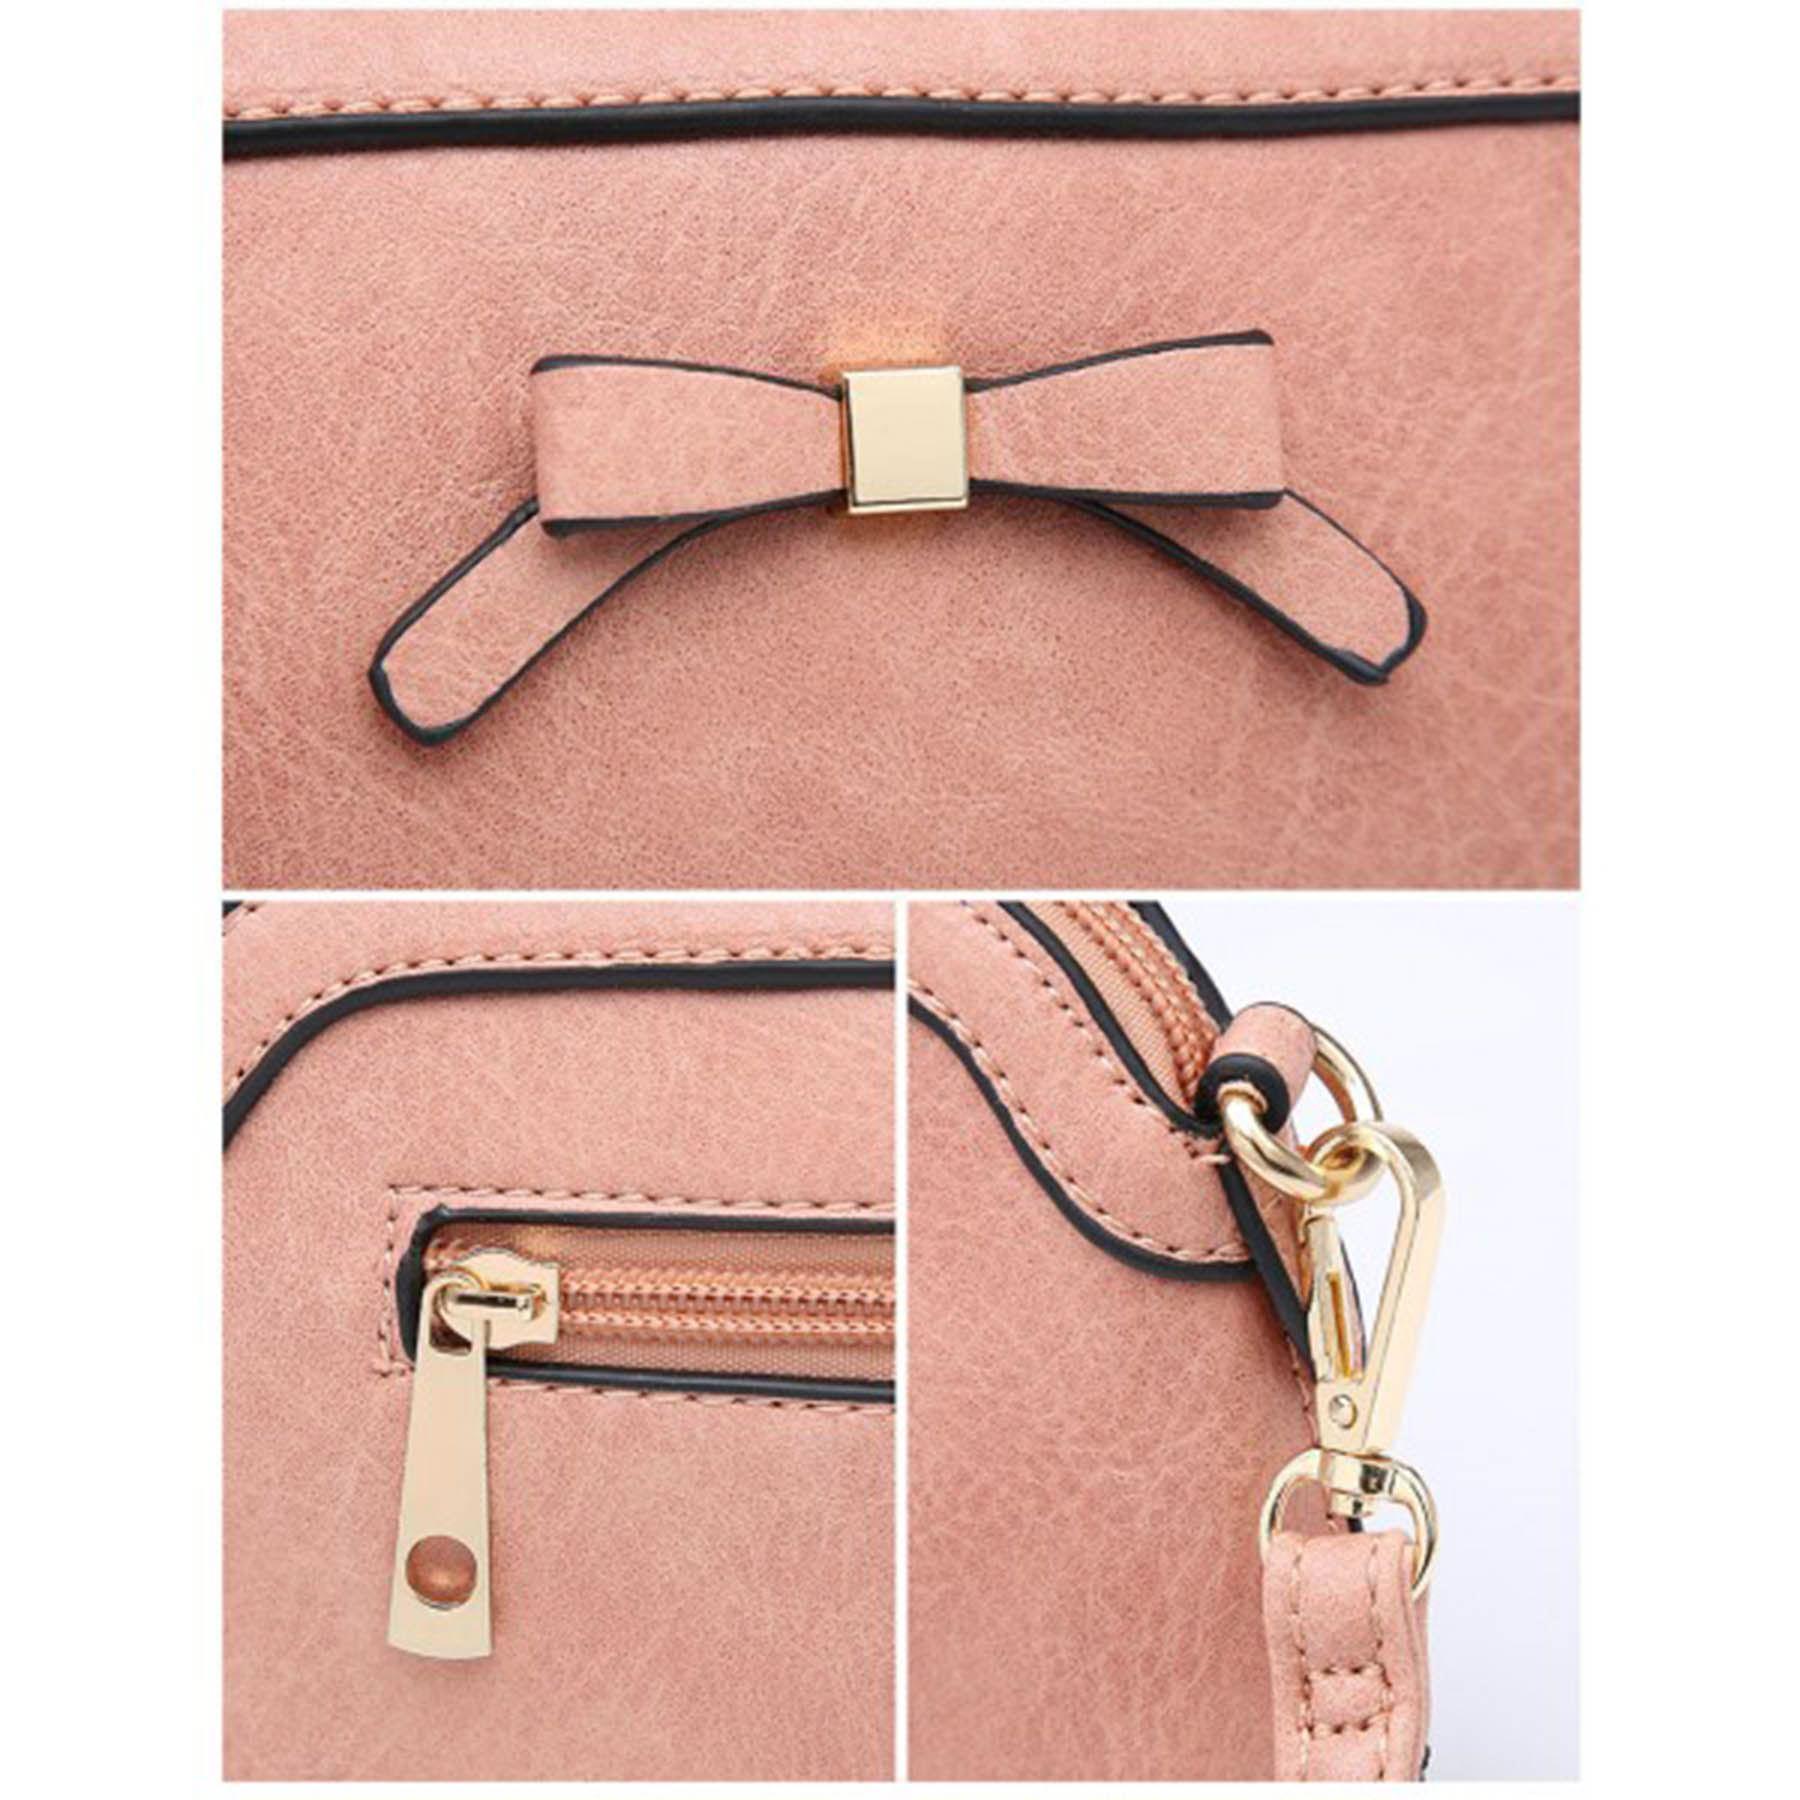 New Cute Bow Detail Faux Leather Ladies Small Crossbody Bag Handbag